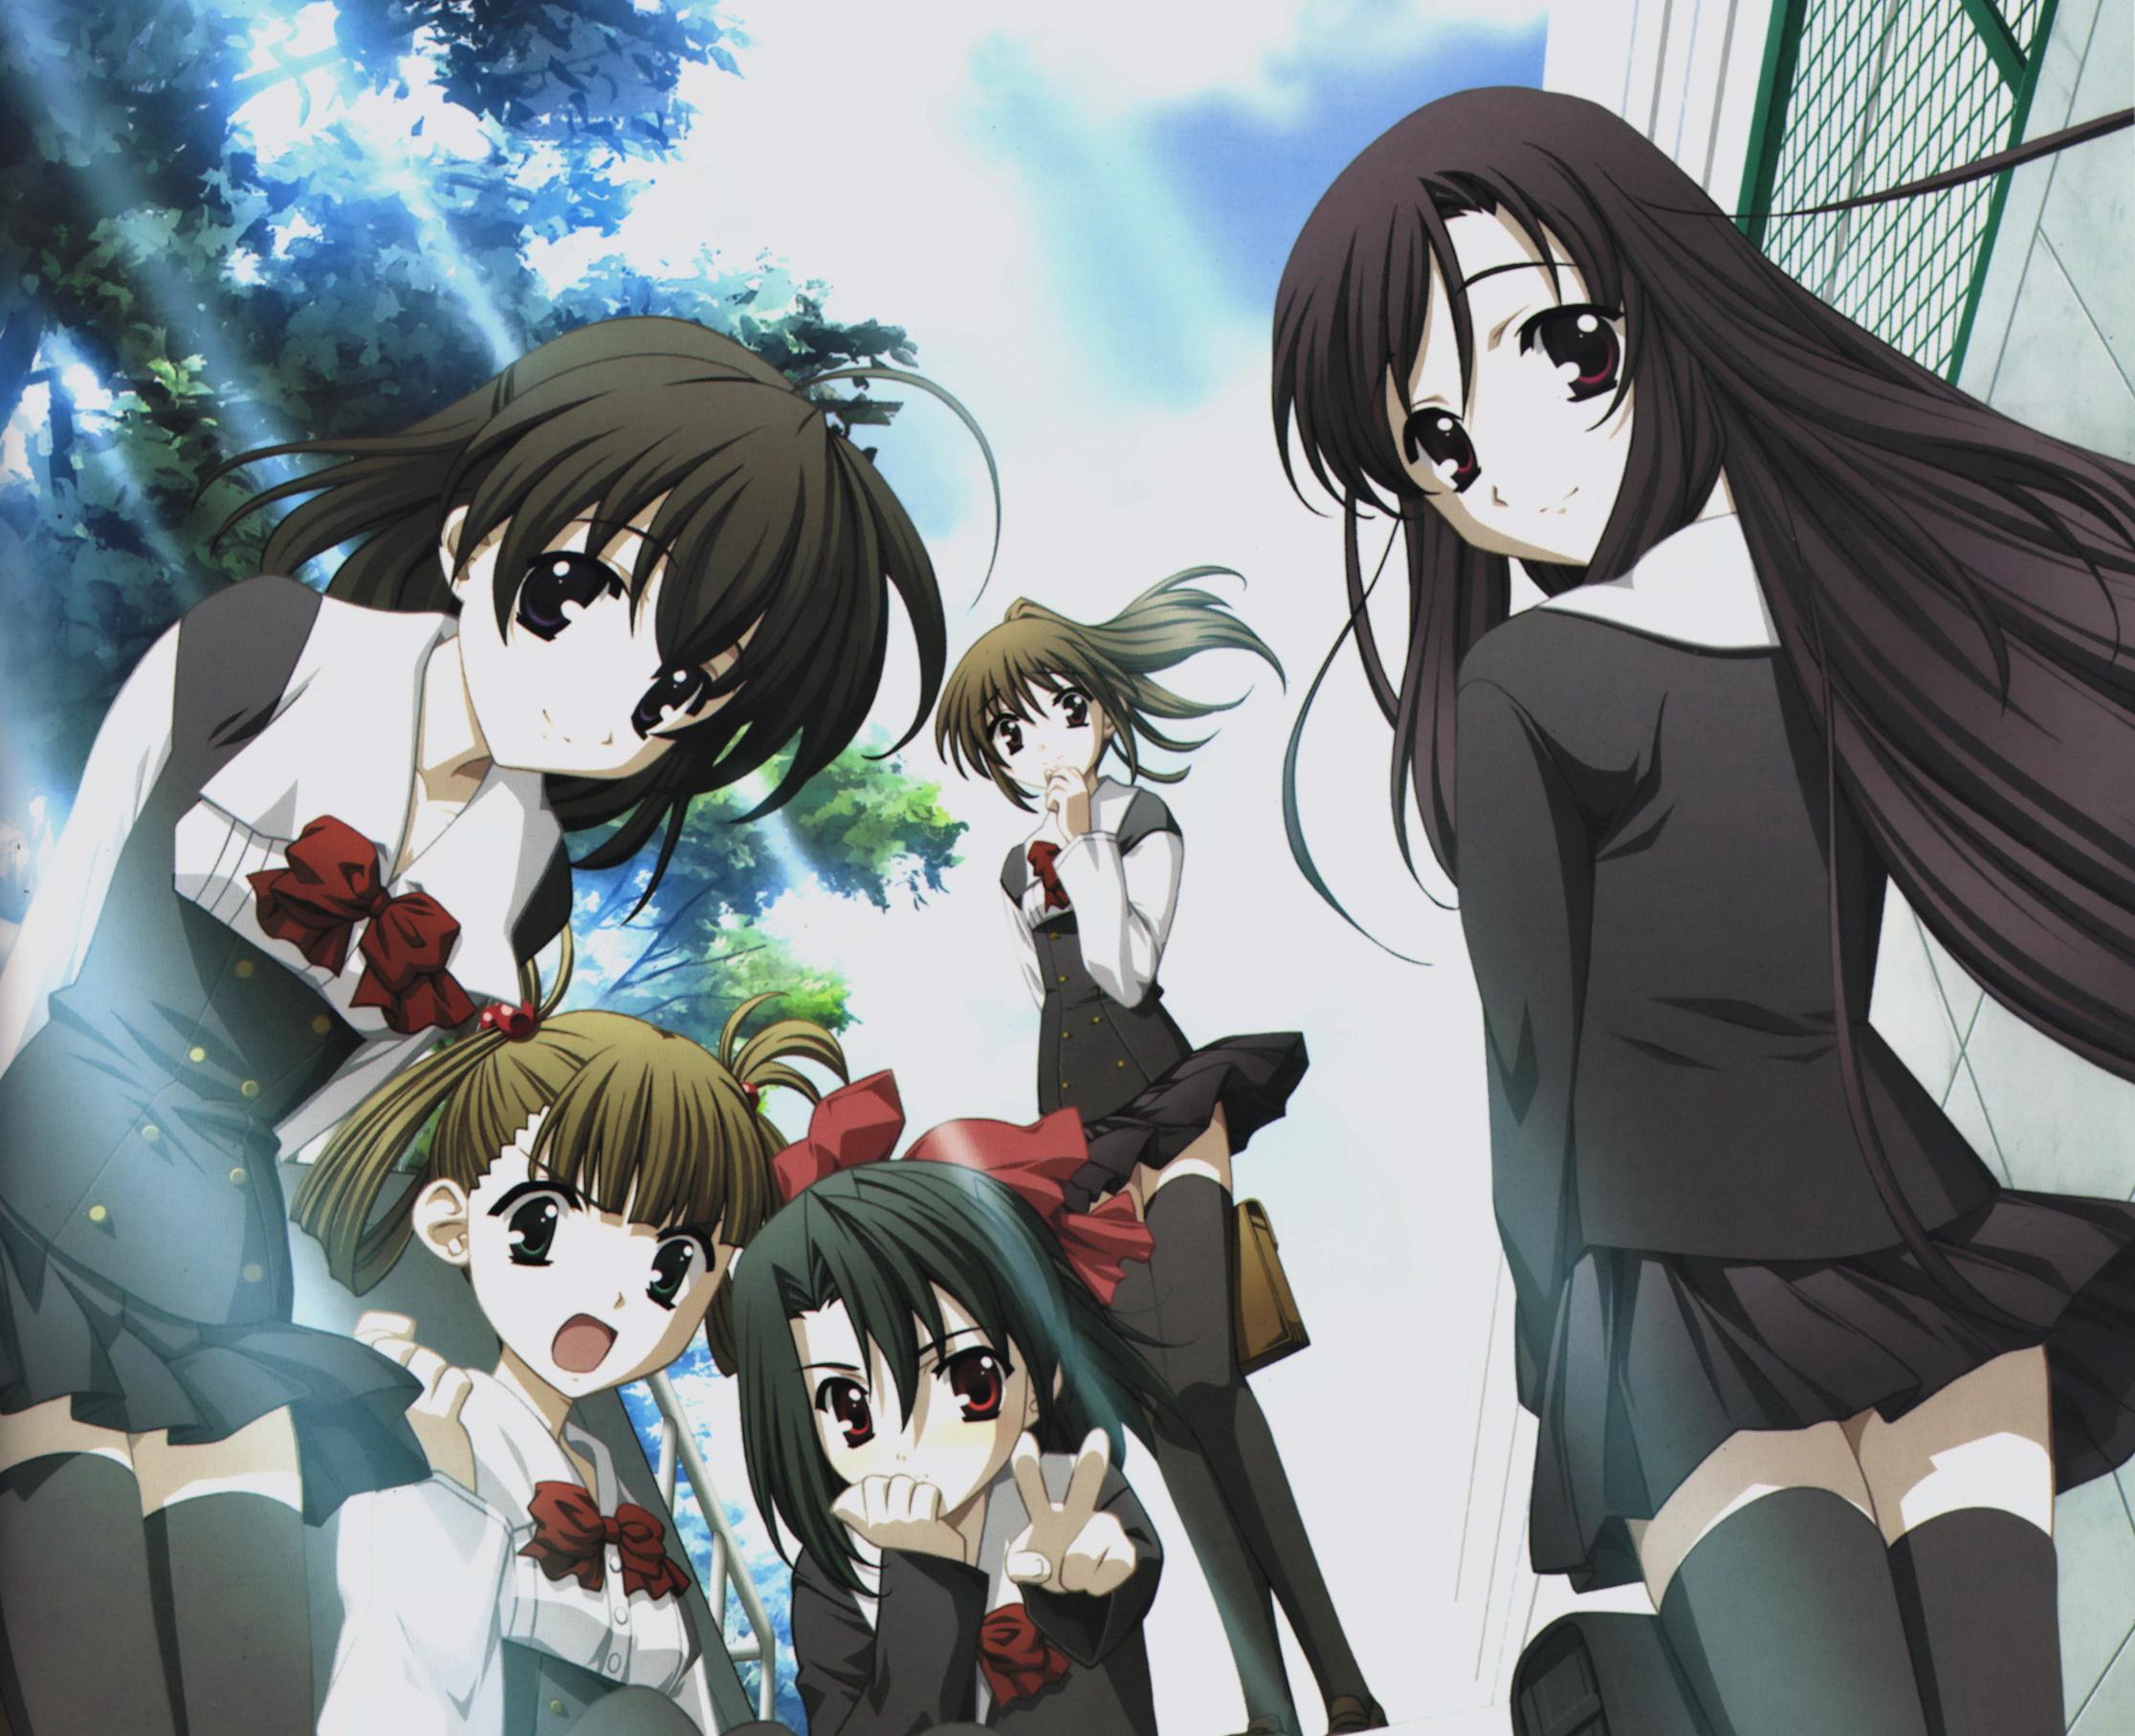 Desktop Wallpapers School Days Anime young woman 2232x1815 2232x1815